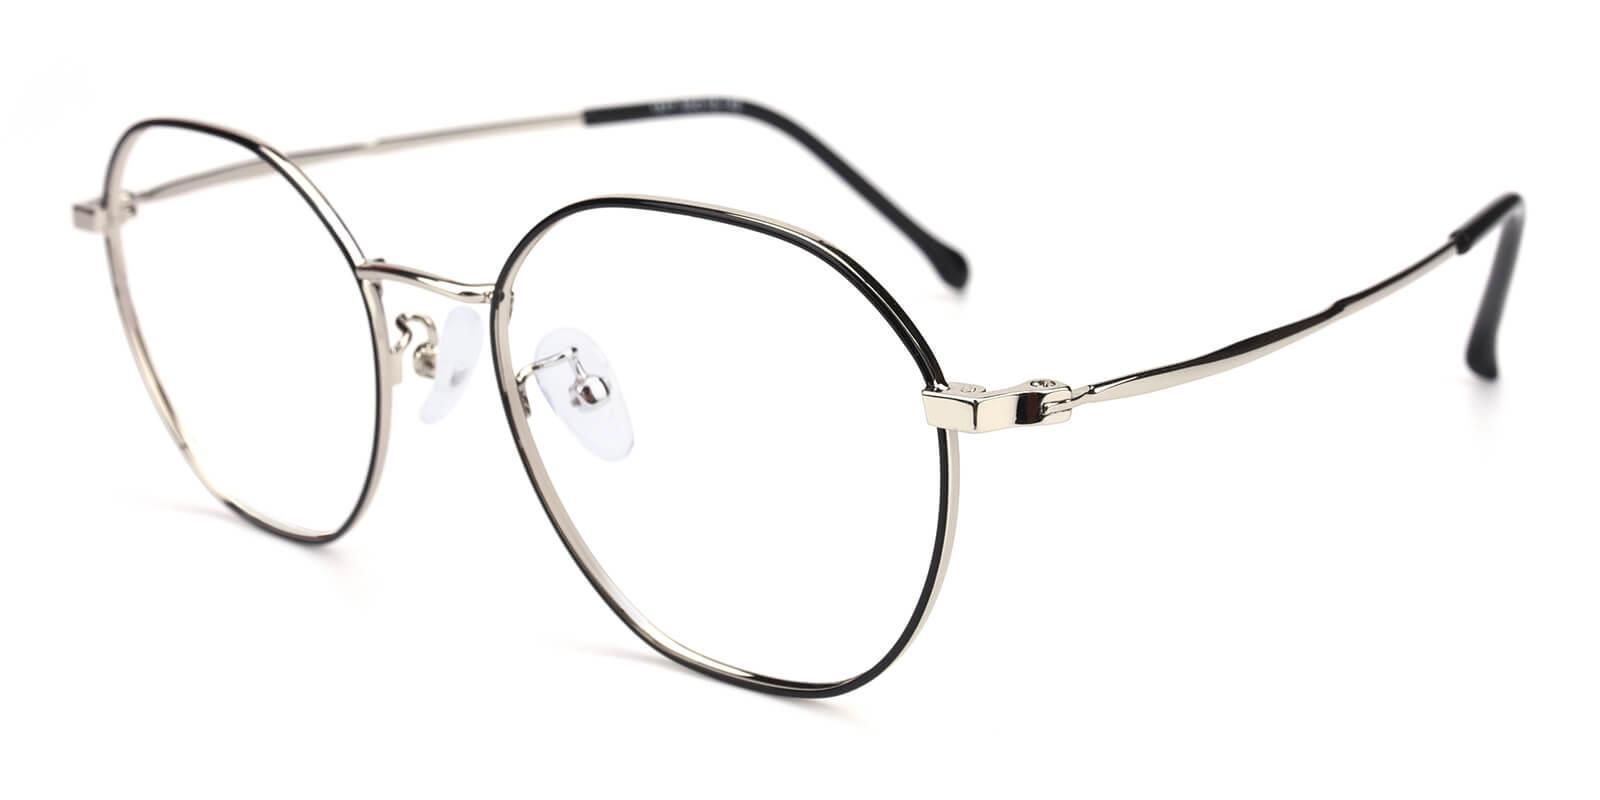 Govind-Black-Round-Metal-Eyeglasses-additional1